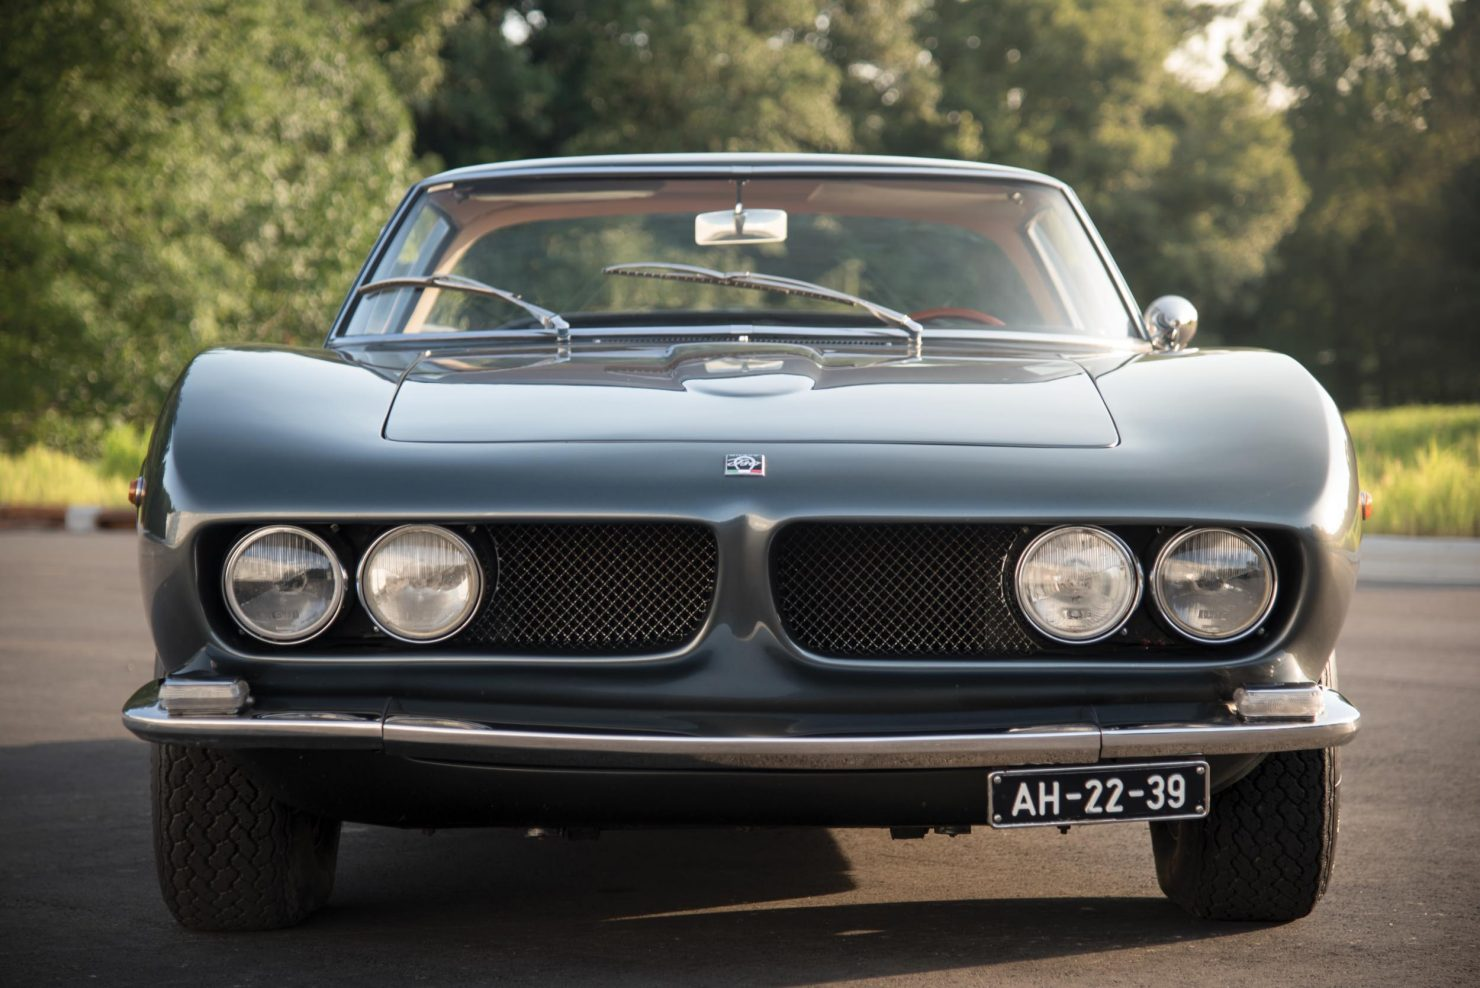 iso grifo car 10 1480x988 - 1966 Iso Grifo GL Series I